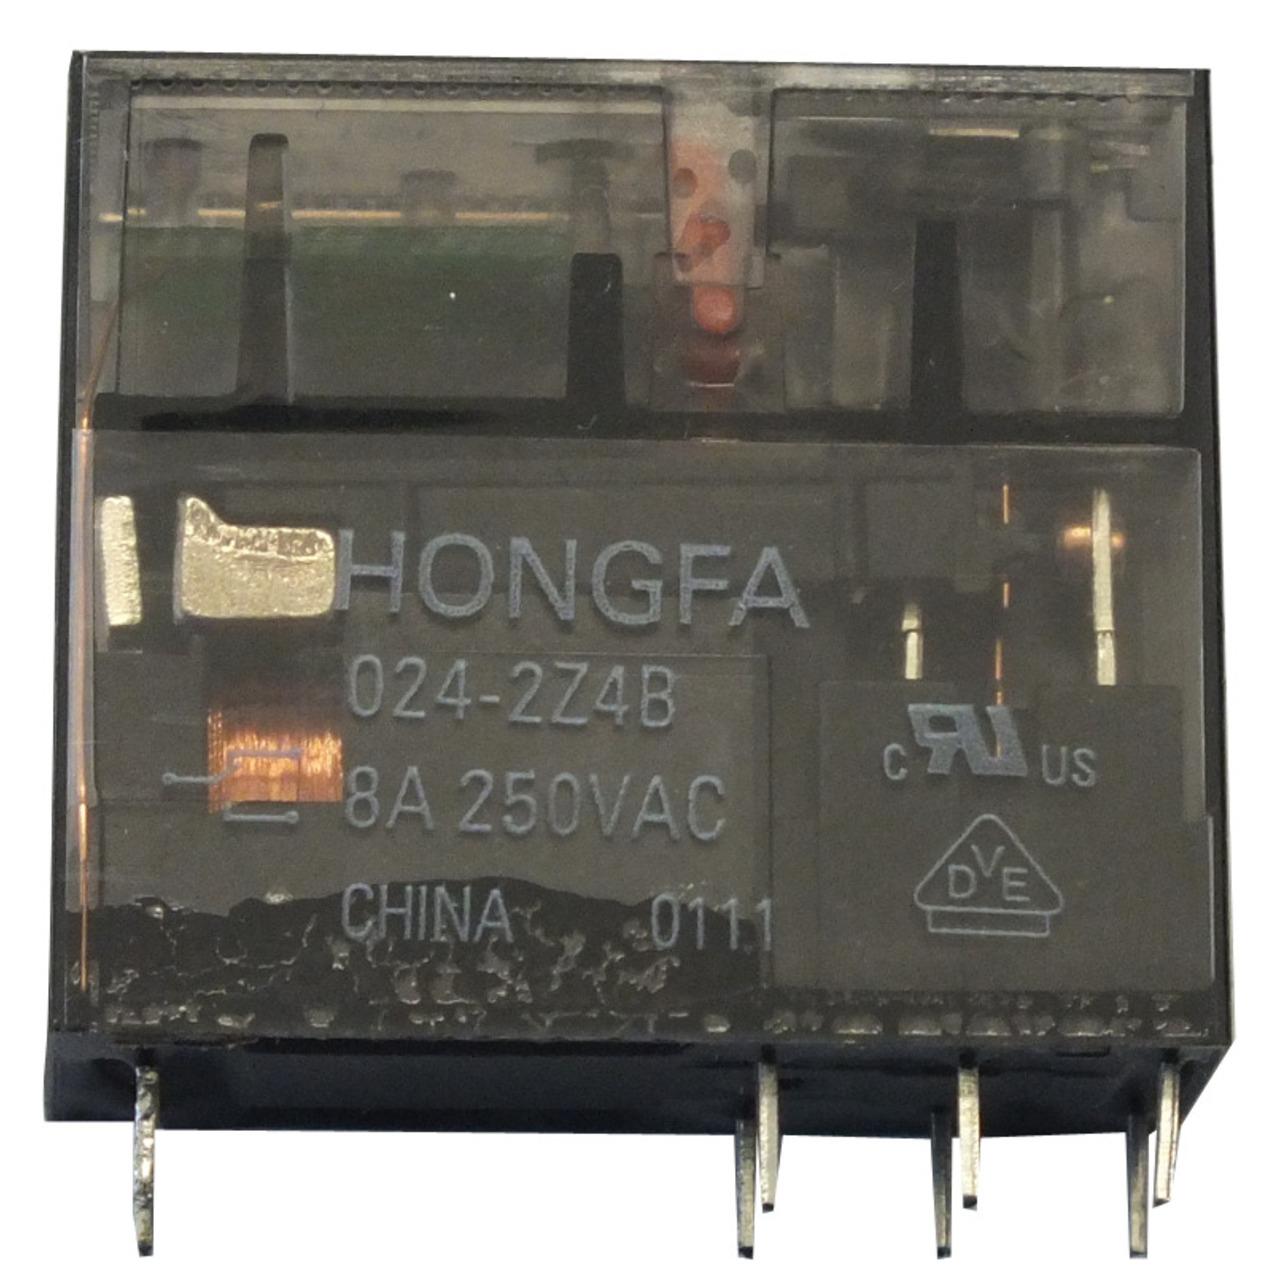 HONGFA Relais- 24 V- 2 Öffner-Schliesser- HF115FP-024-2Z4B